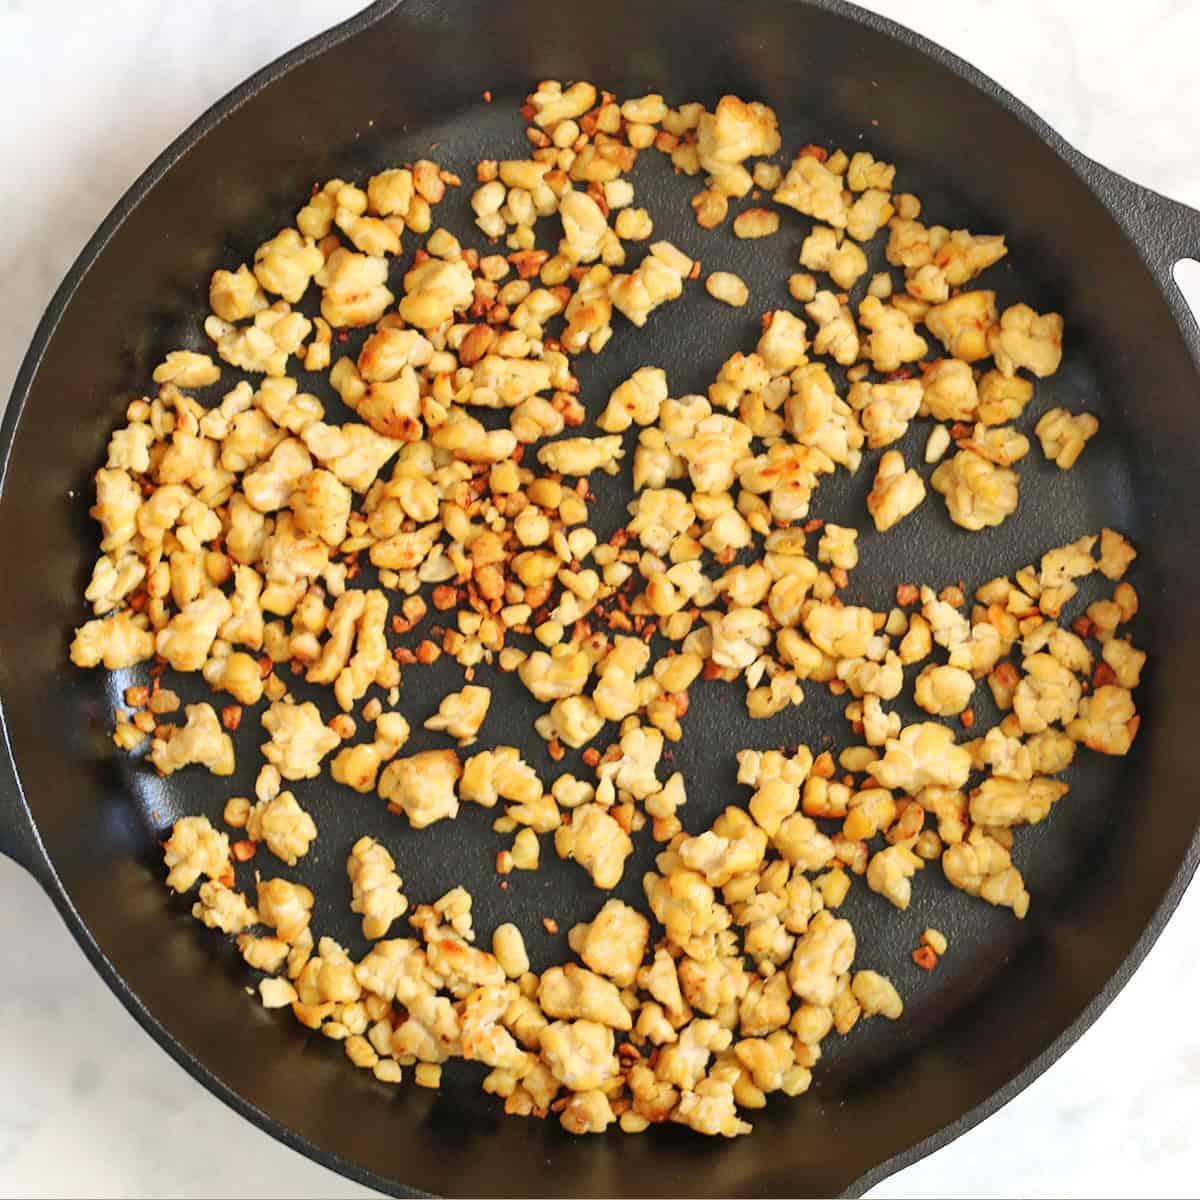 tempeh frying